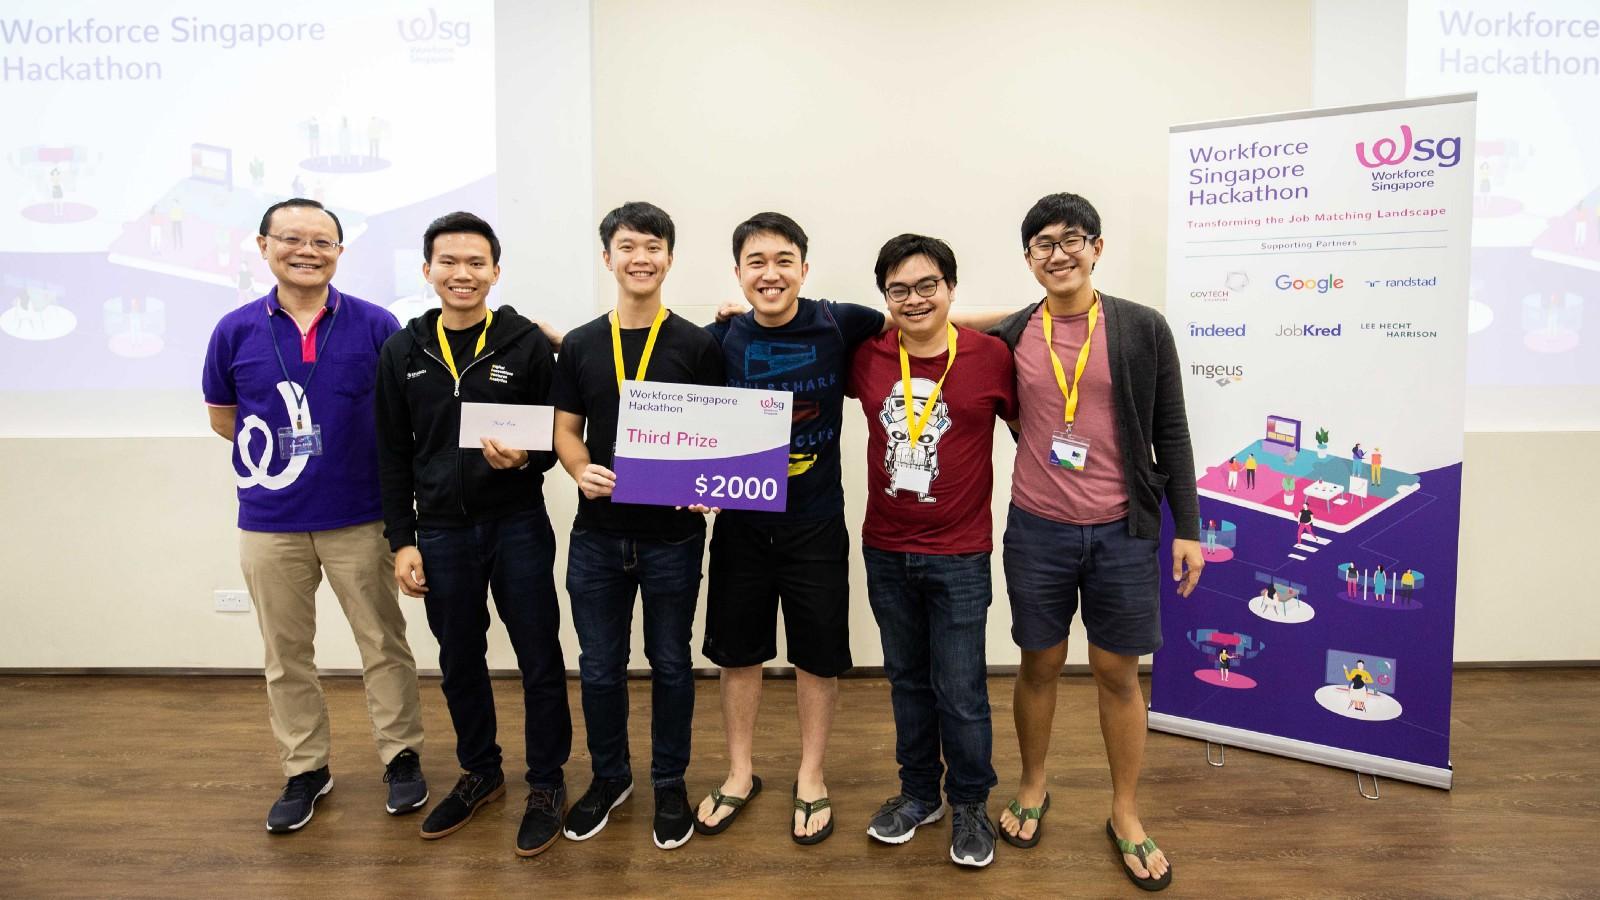 Third Prize Winner,  Team StaffMany